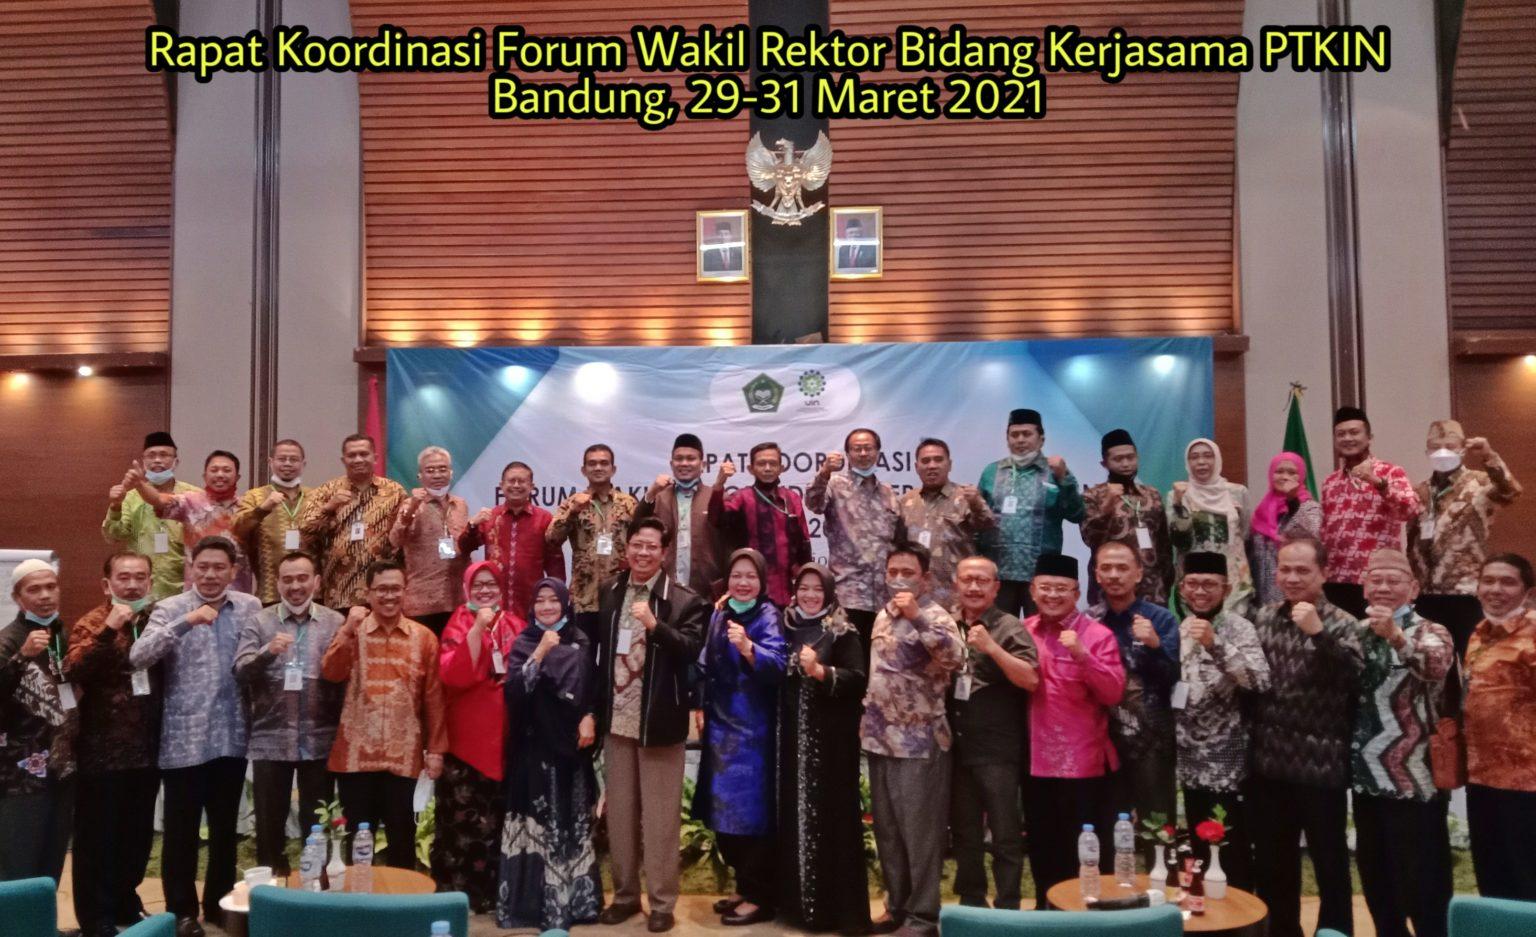 WR III Ikuti Rakor Forum Wakil Rektor Kerjasama PTKIN